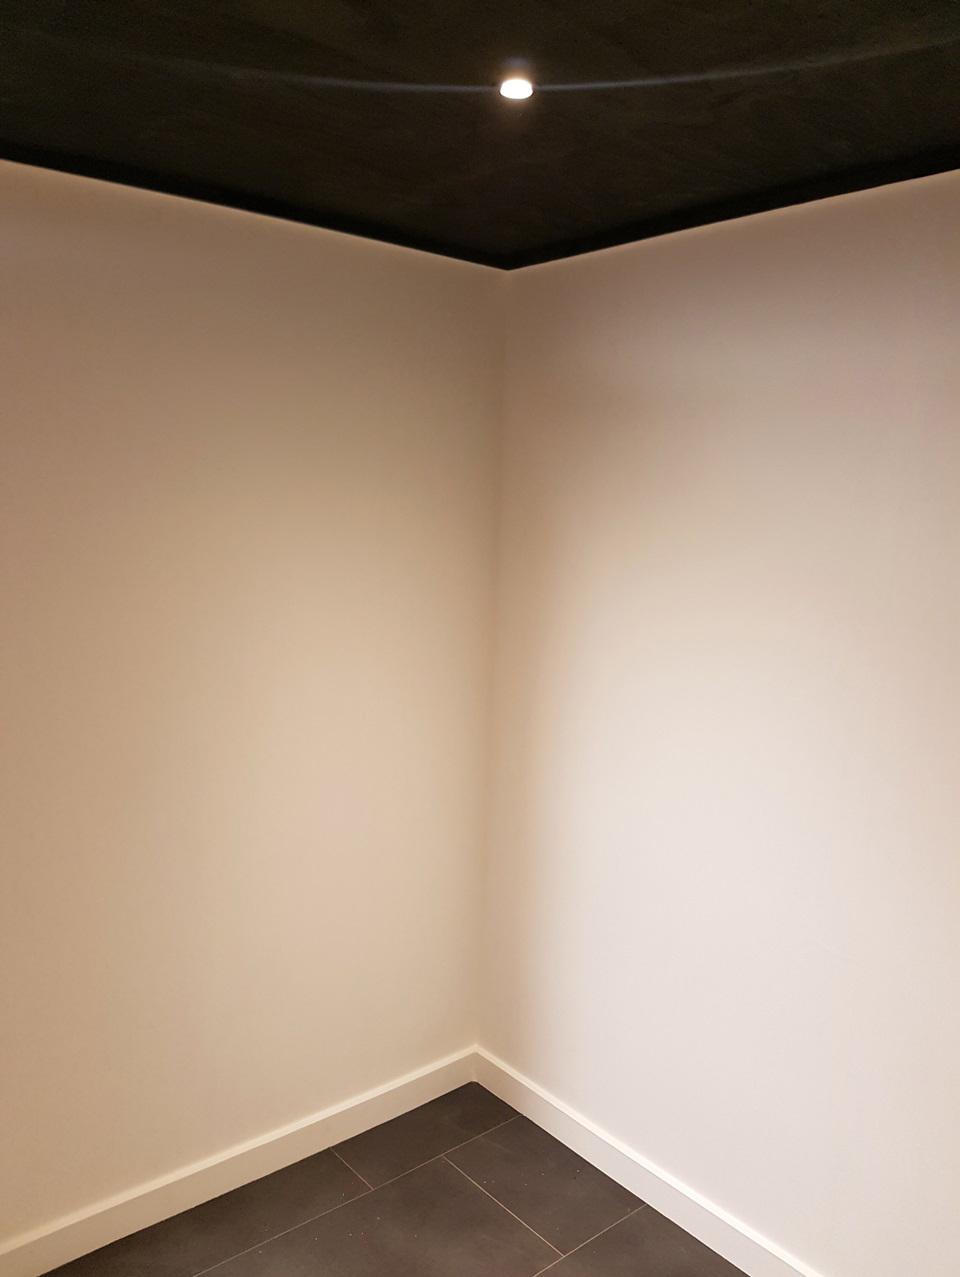 Garage_plinten_plafond2.jpg